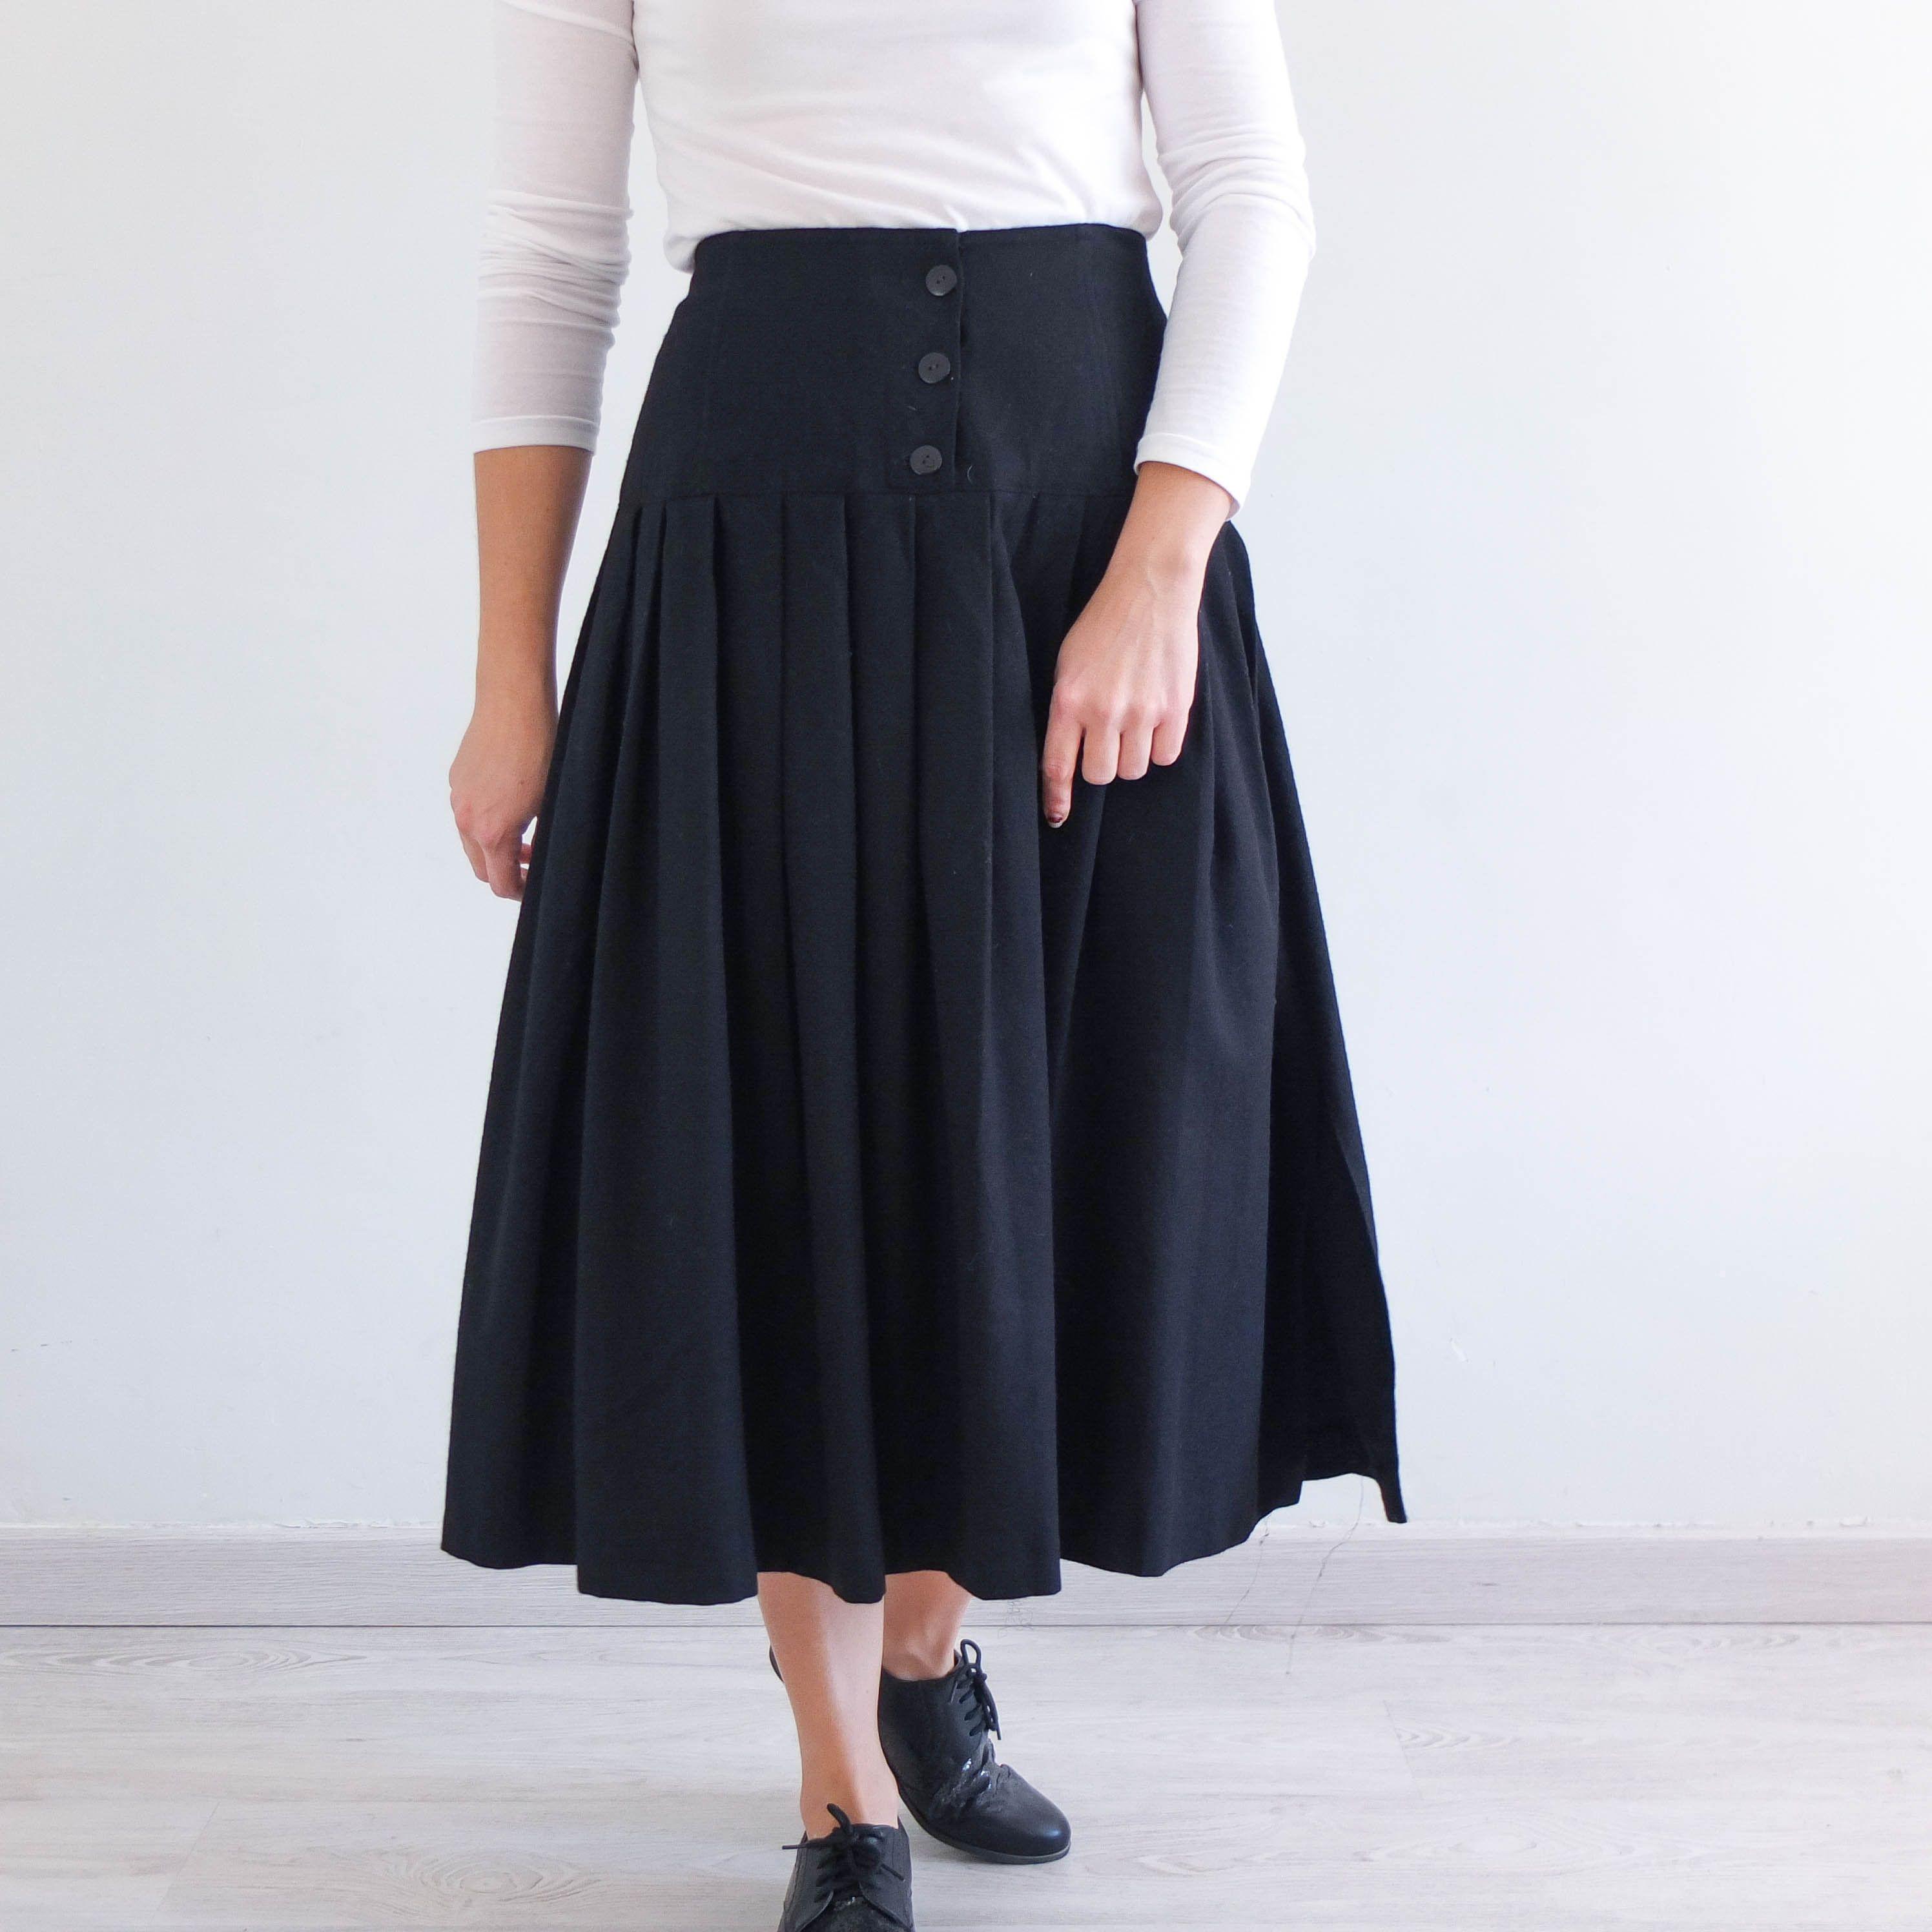 Vintage 80s Cotton Colorblock Circle Skirt 1980s Minimalist Black and Kahki High Waisted Skirt Size Small 25 26